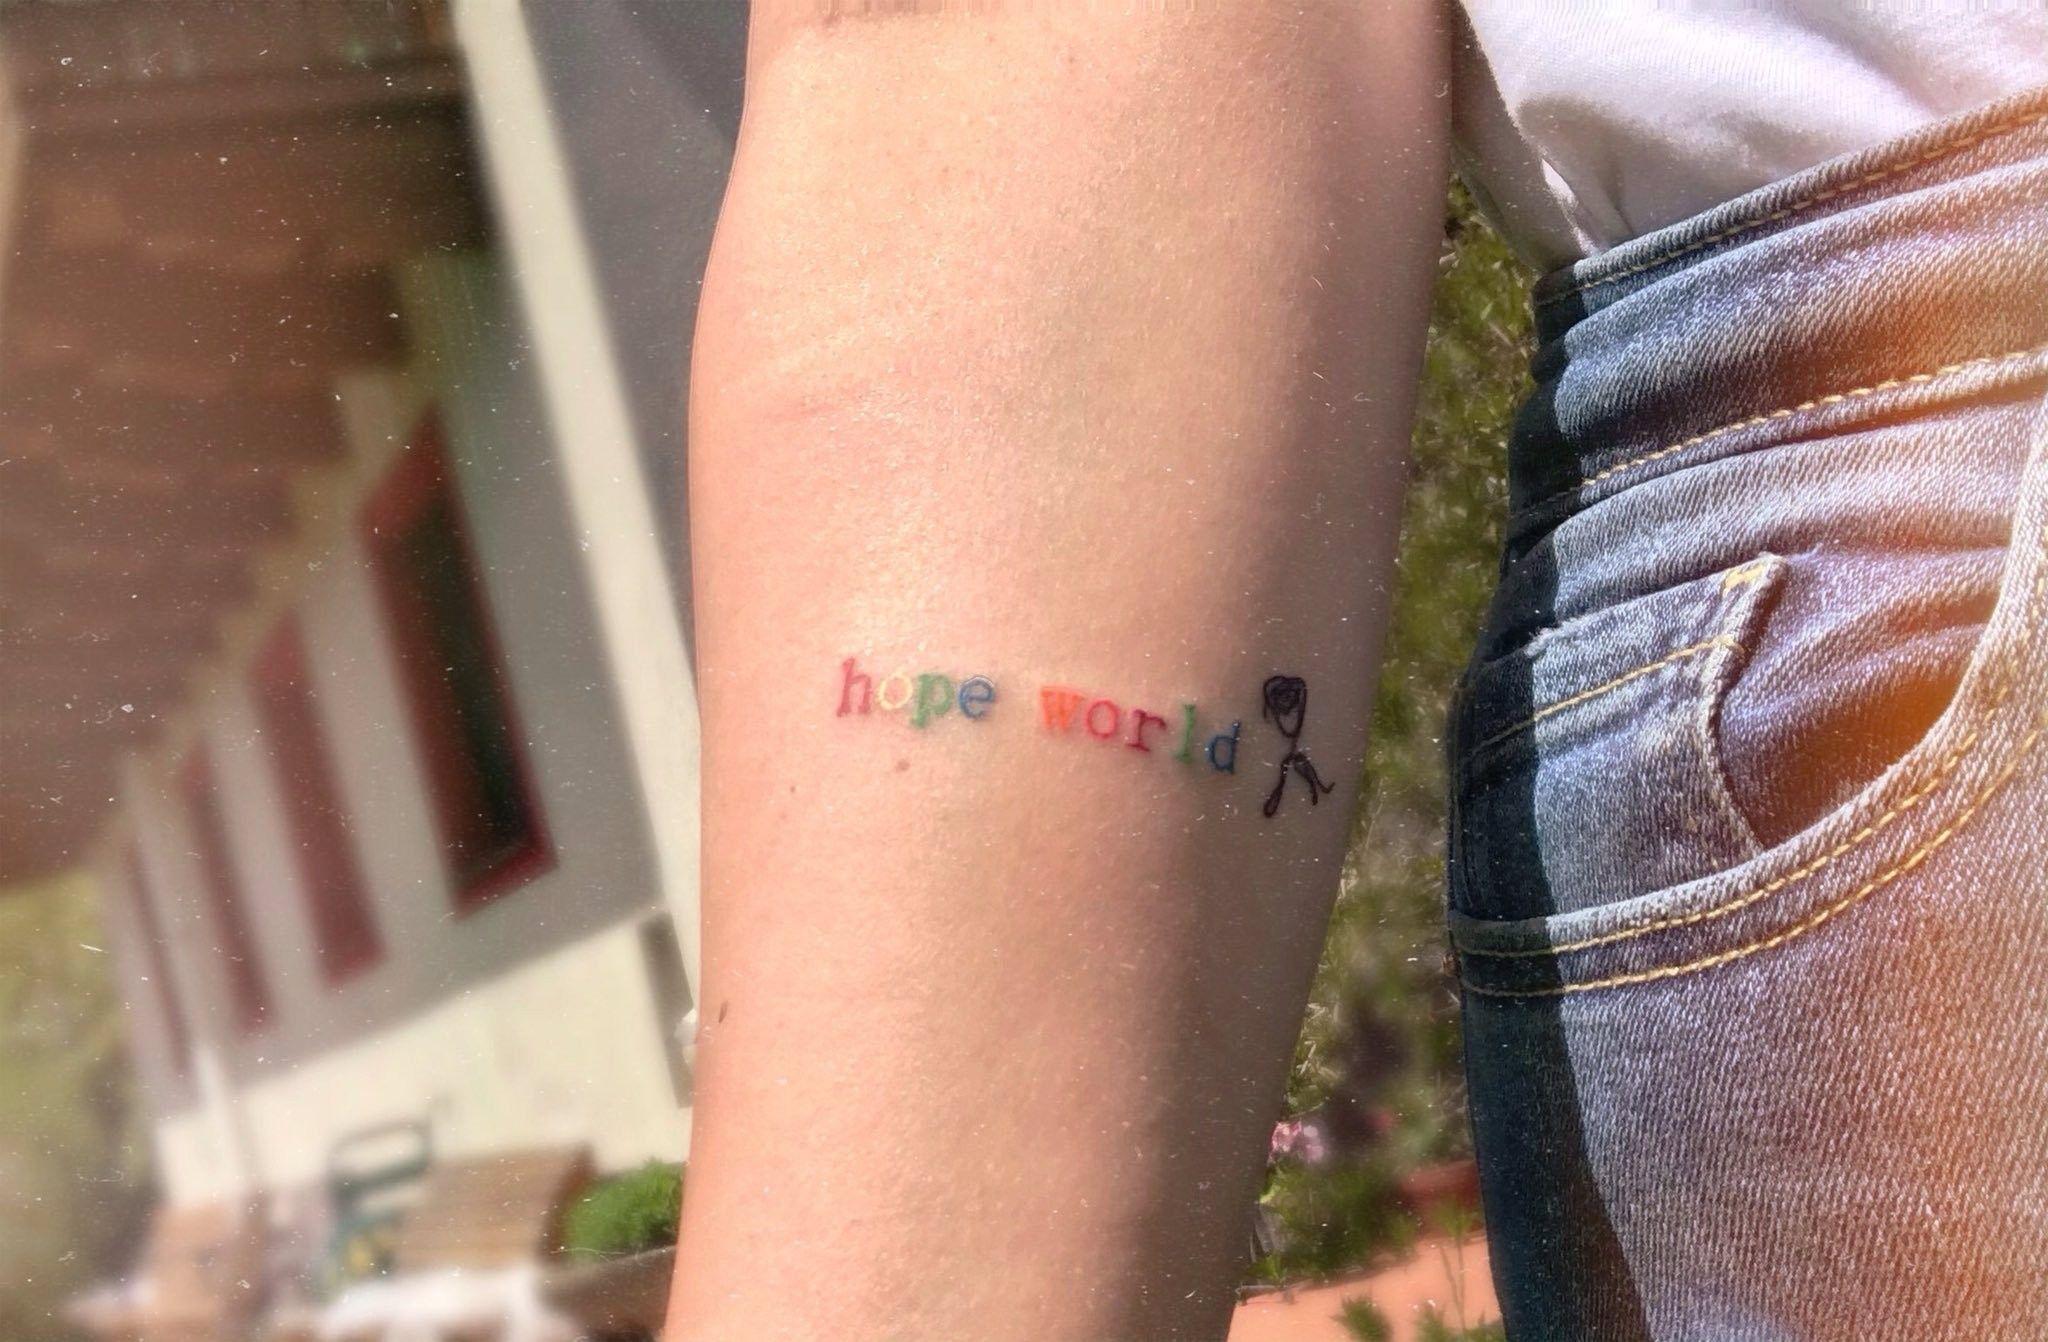 hope world hoseok jhope tattoo bts